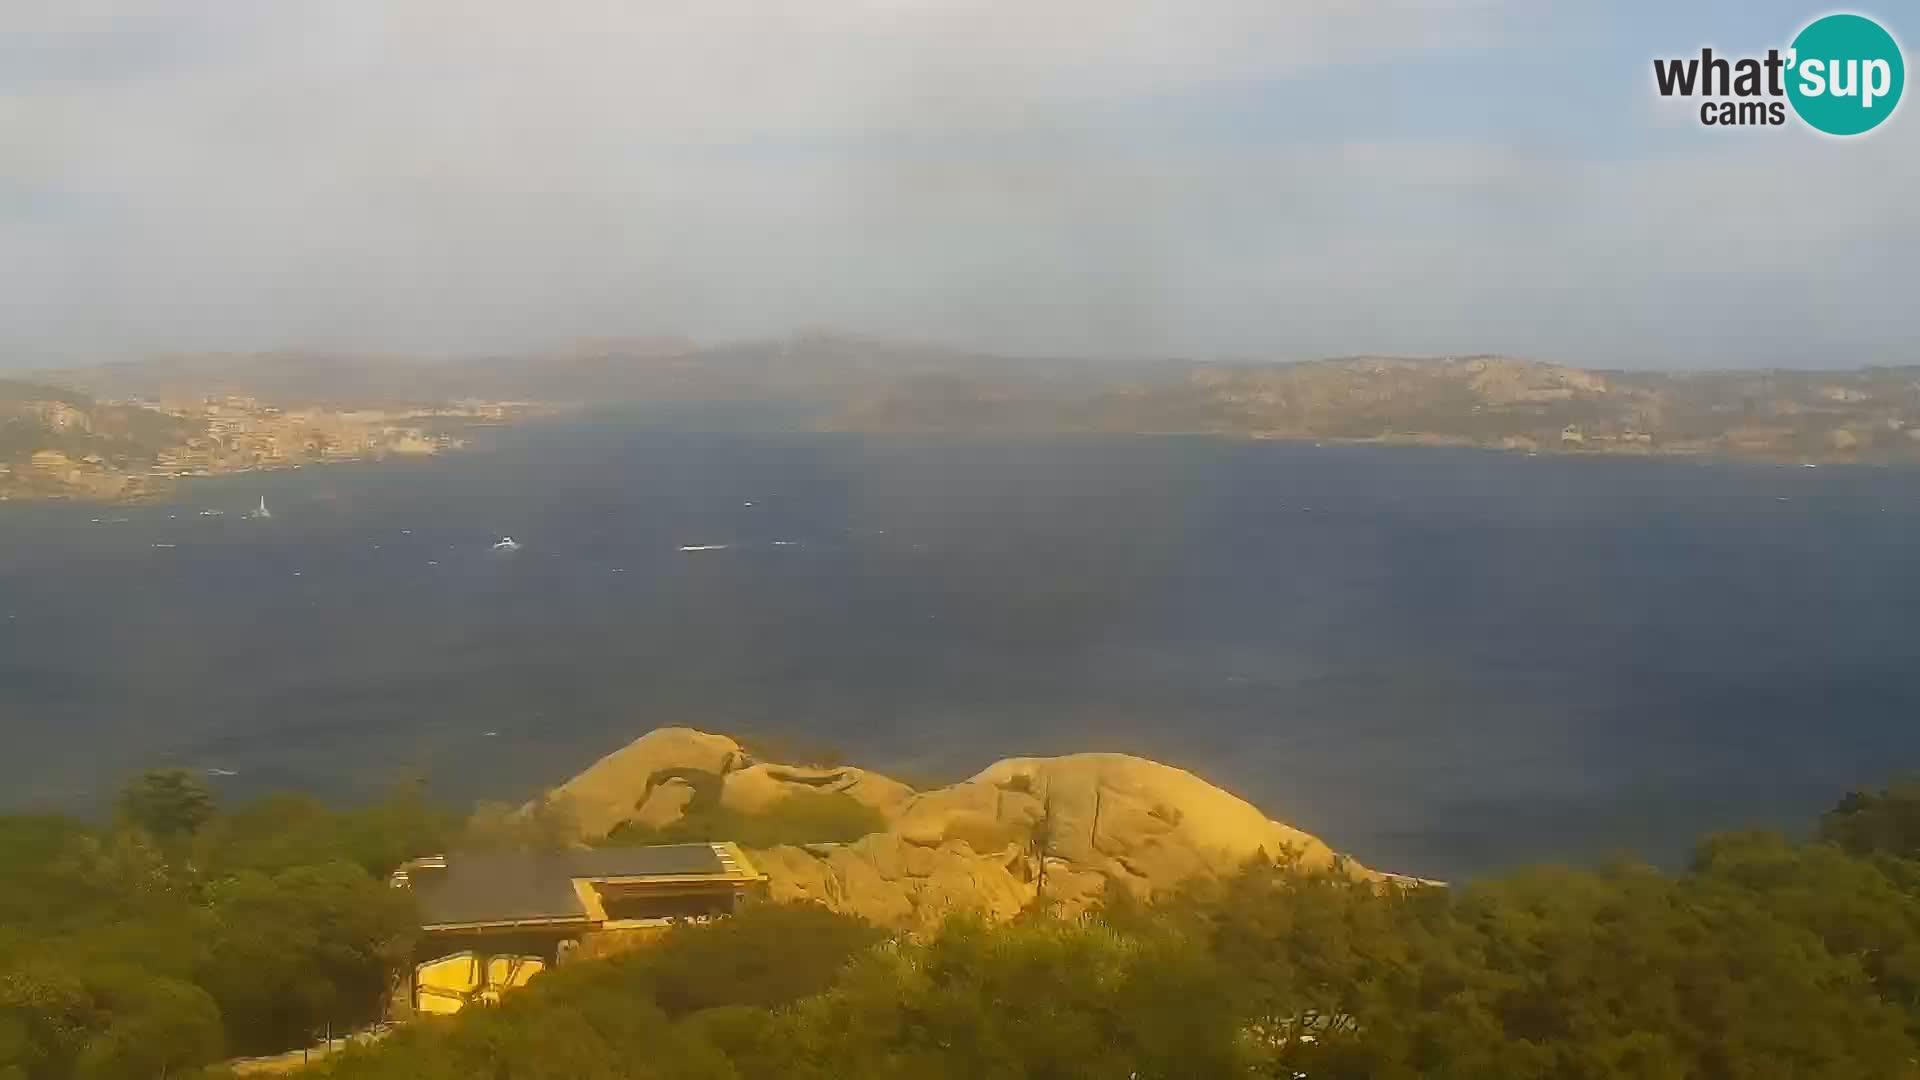 Punta Sardegna camera en vivo la Vedetta – Palau – Maddalena